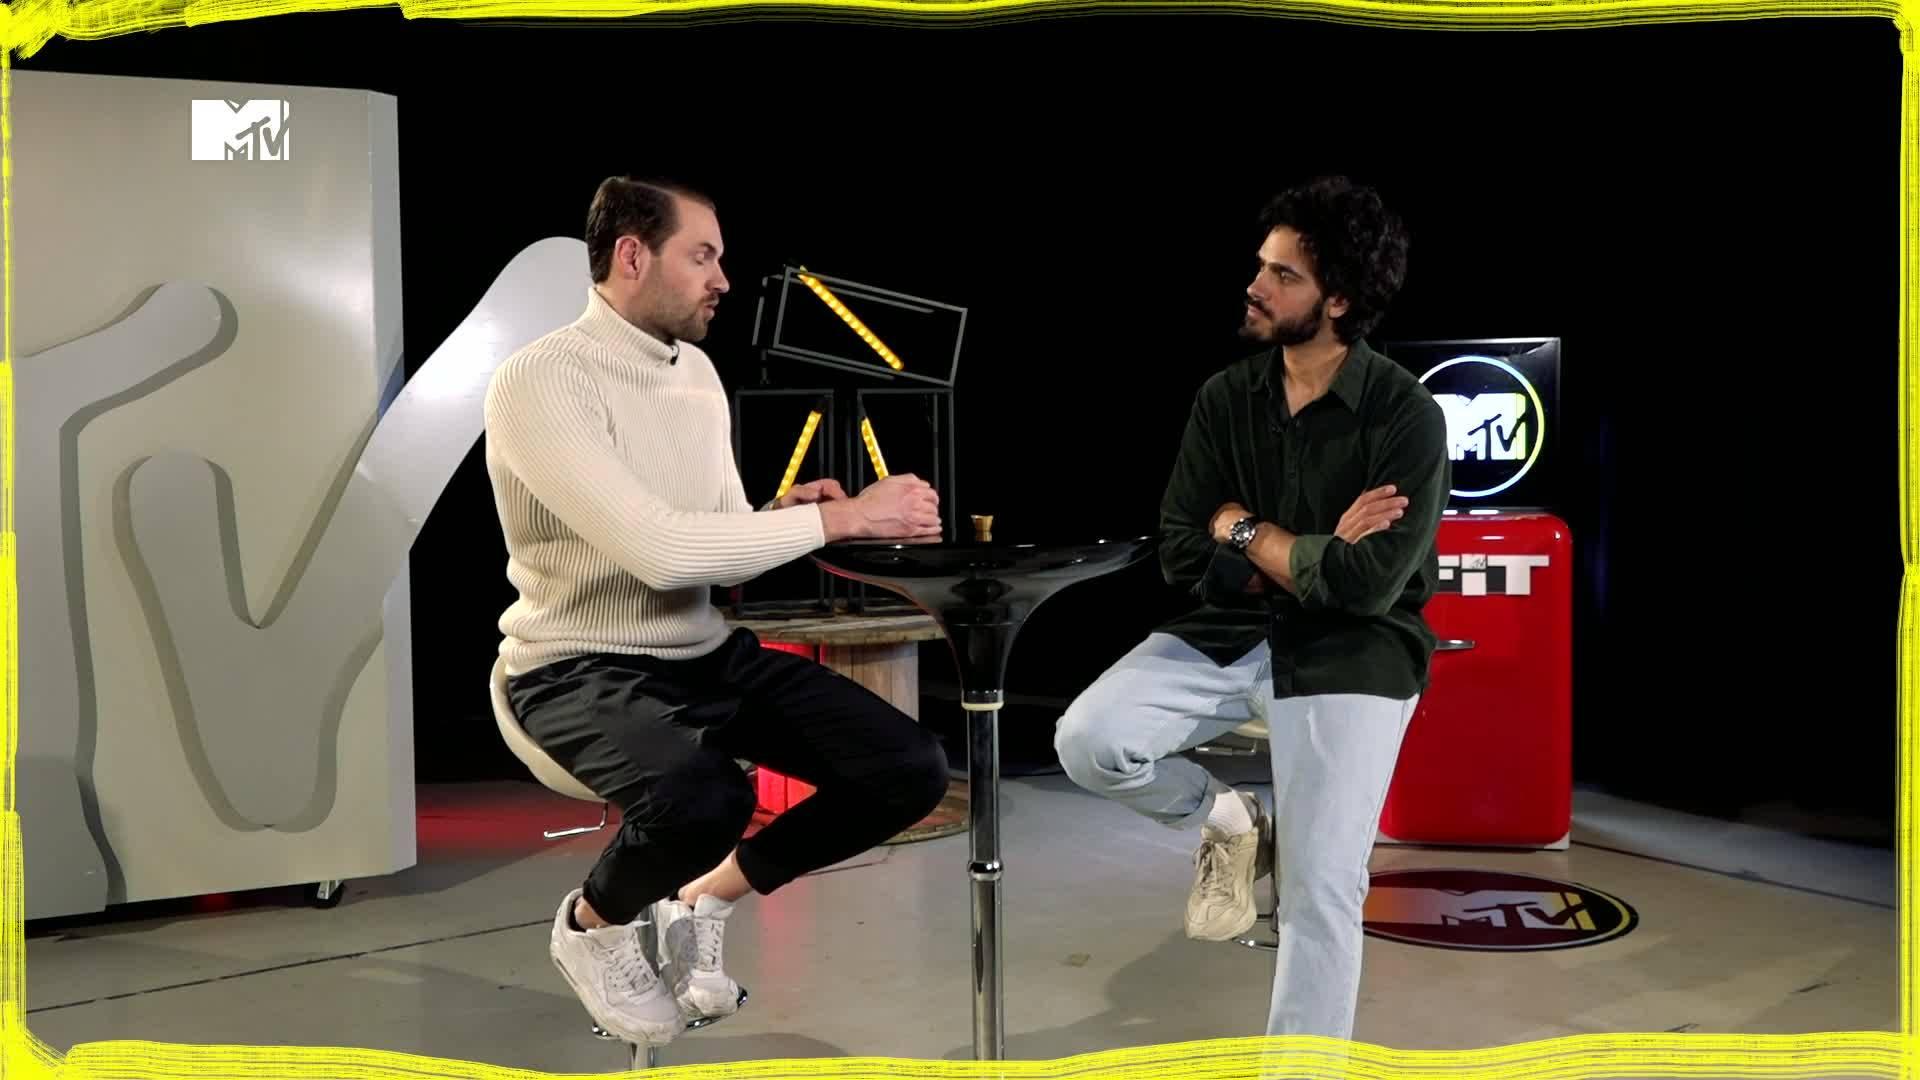 MTV Fit